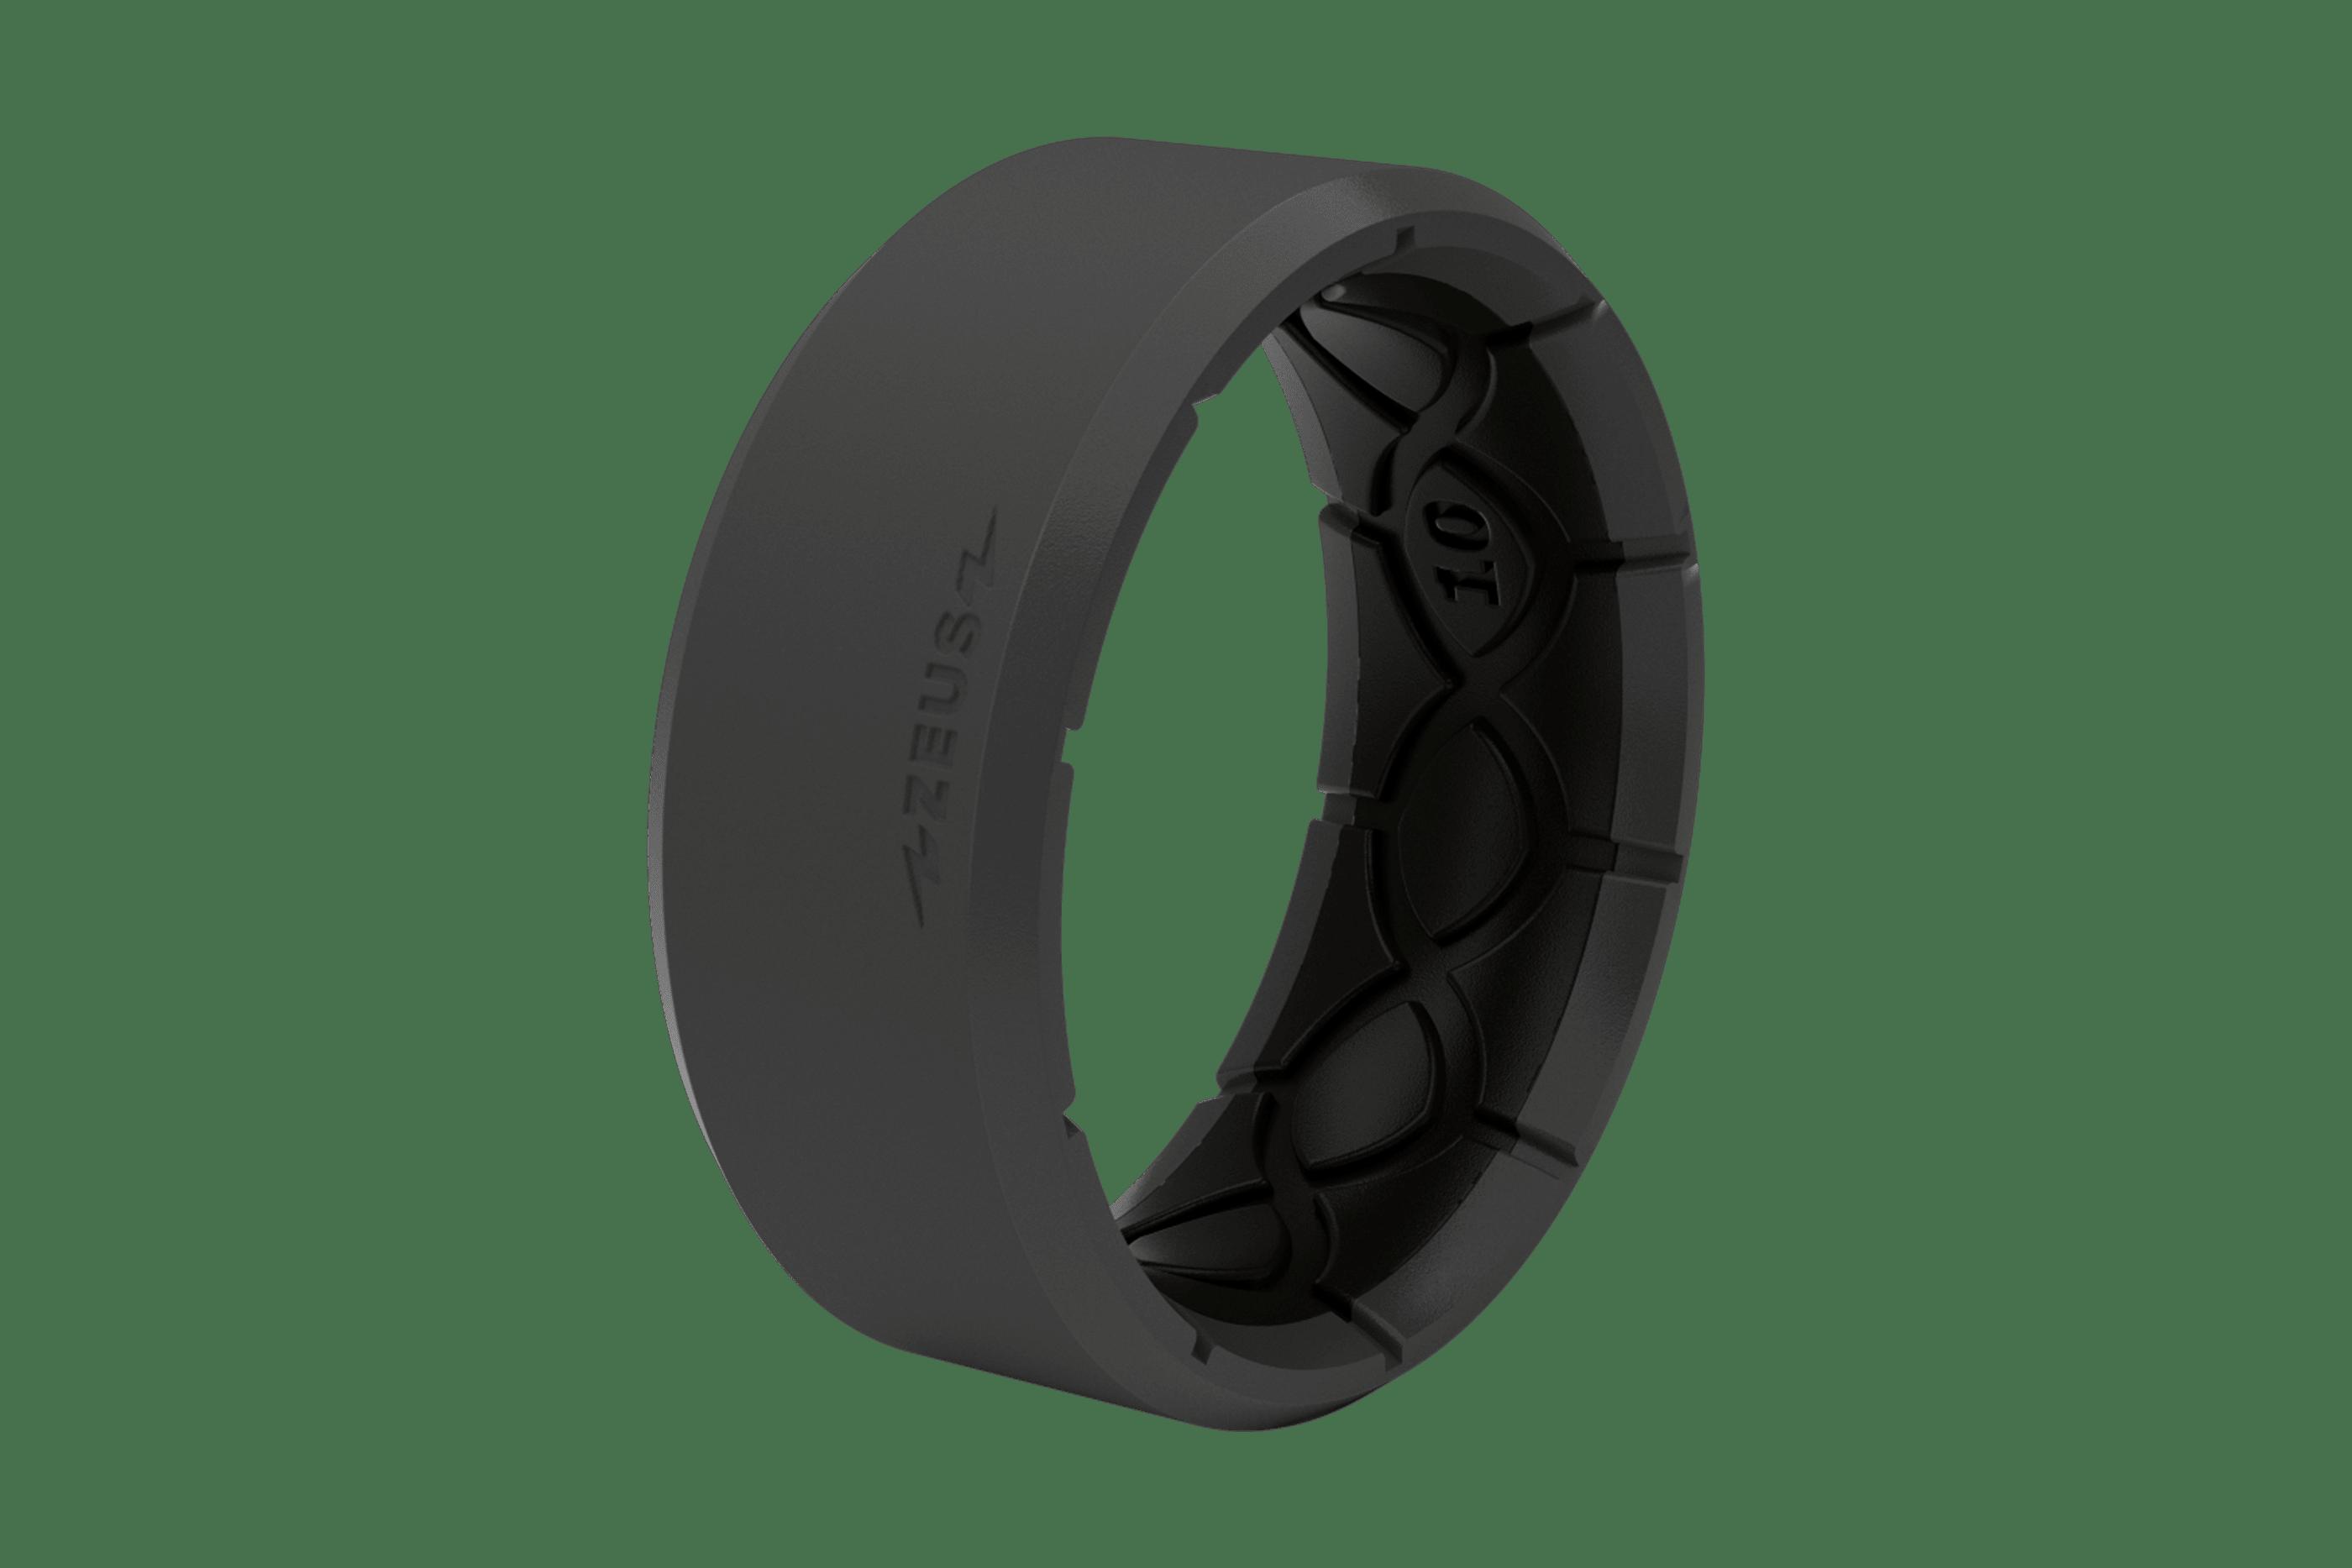 Zeus Edge Deep Stone Grey/Black - Groove Life Silicone Wedding Rings